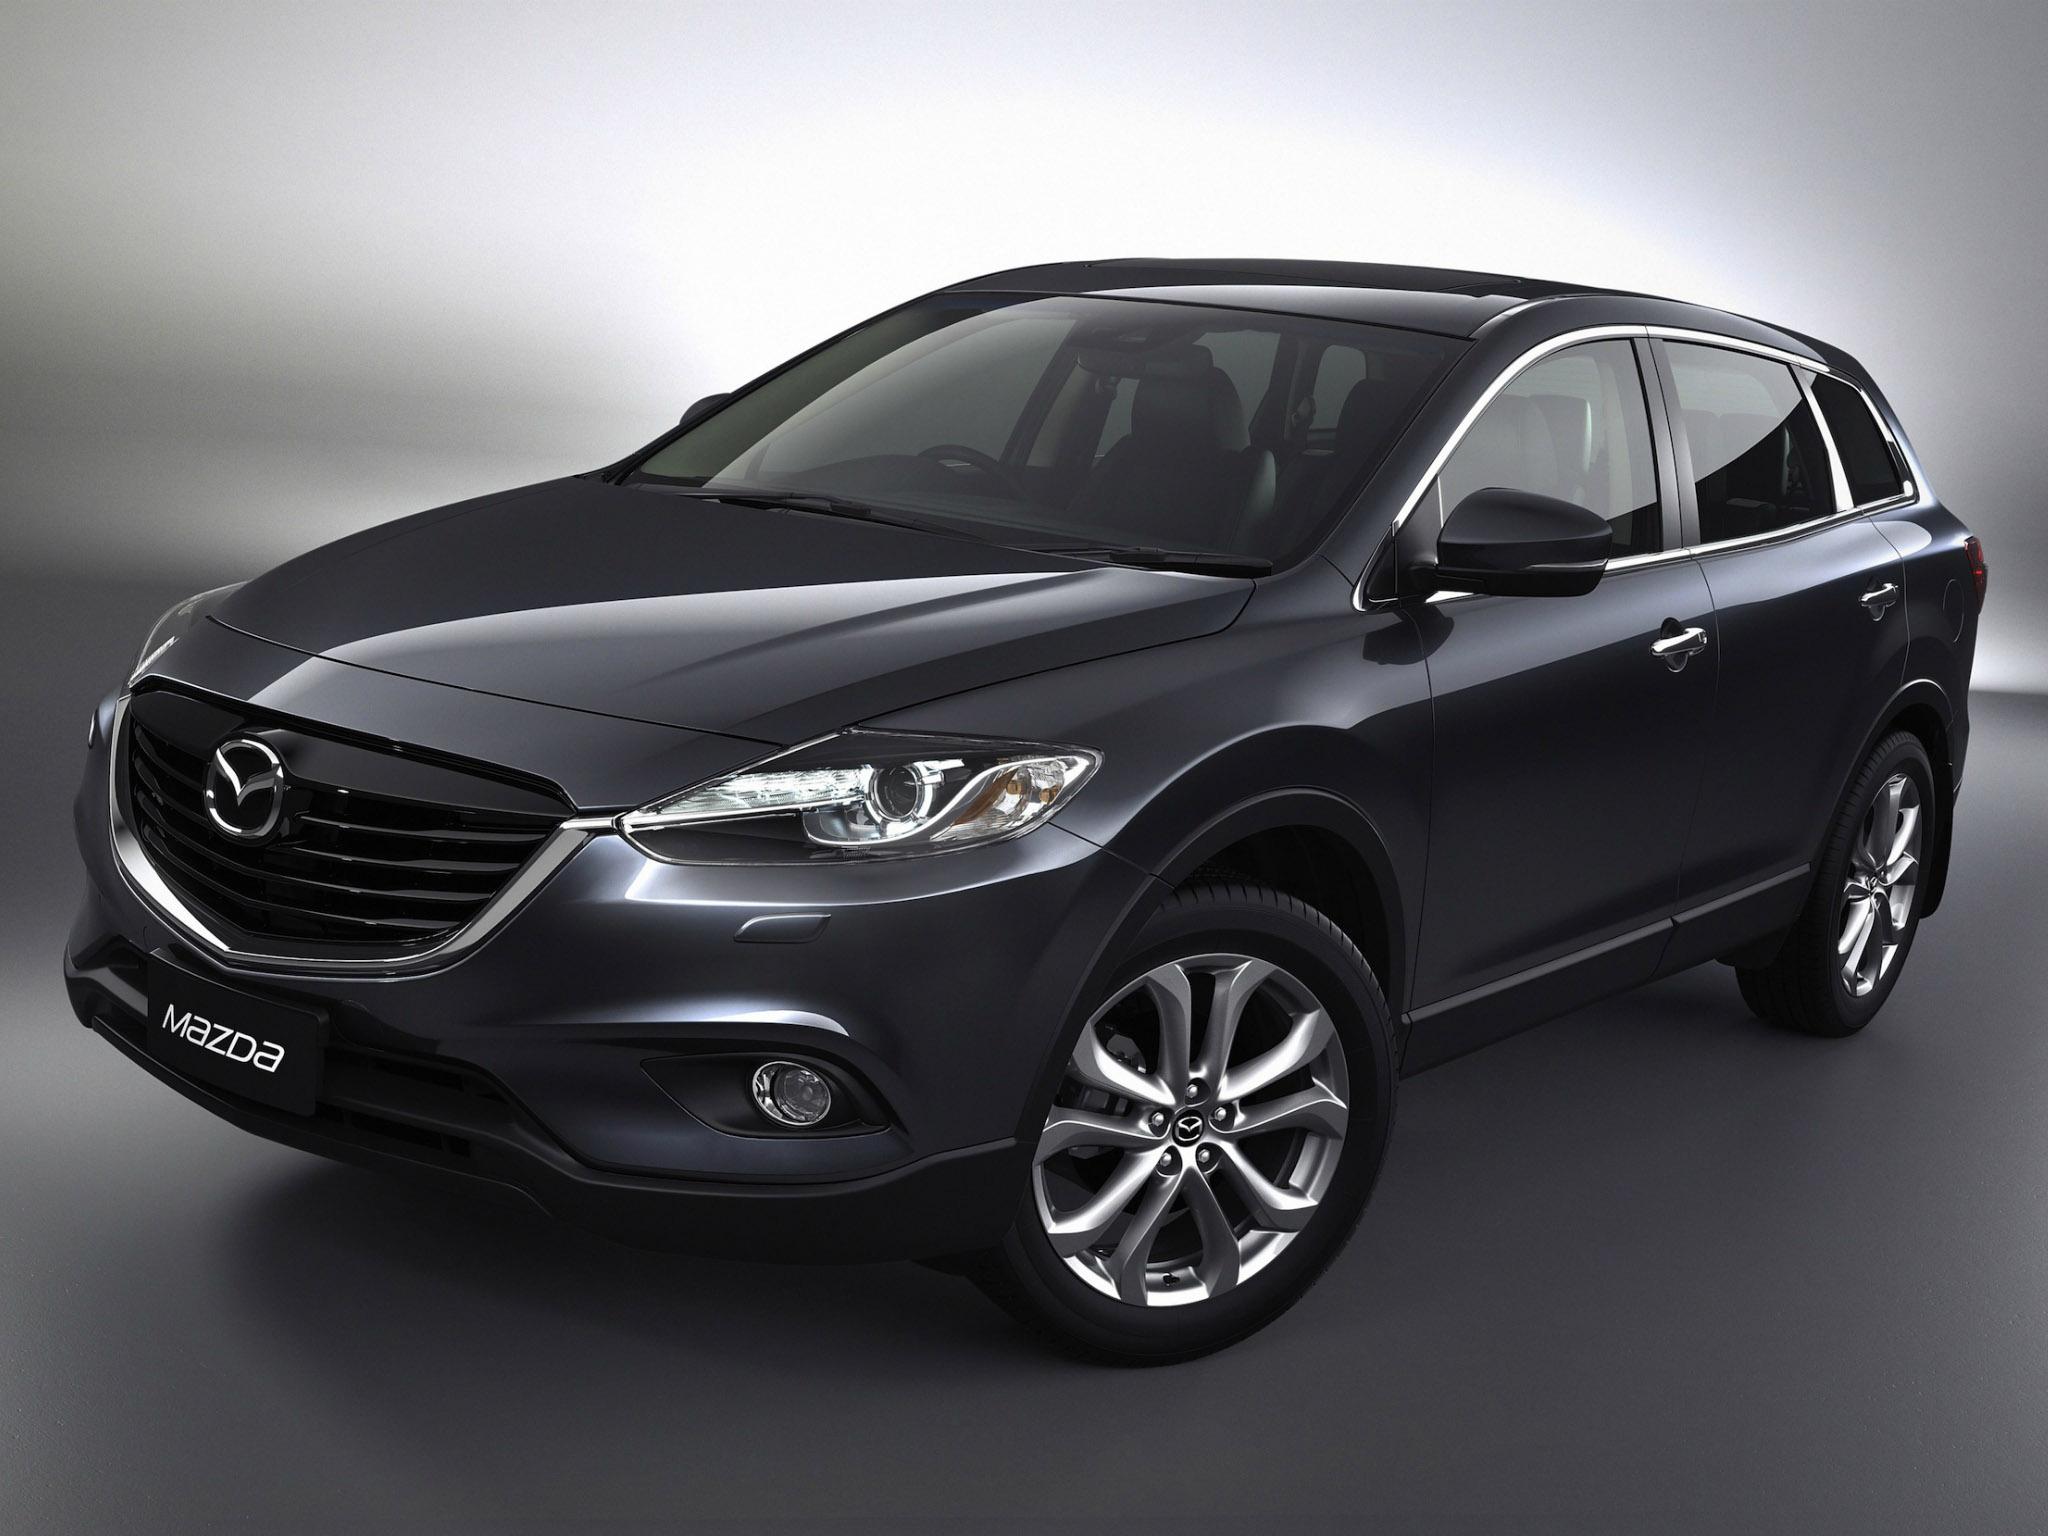 Mazda CX-9 photo #1